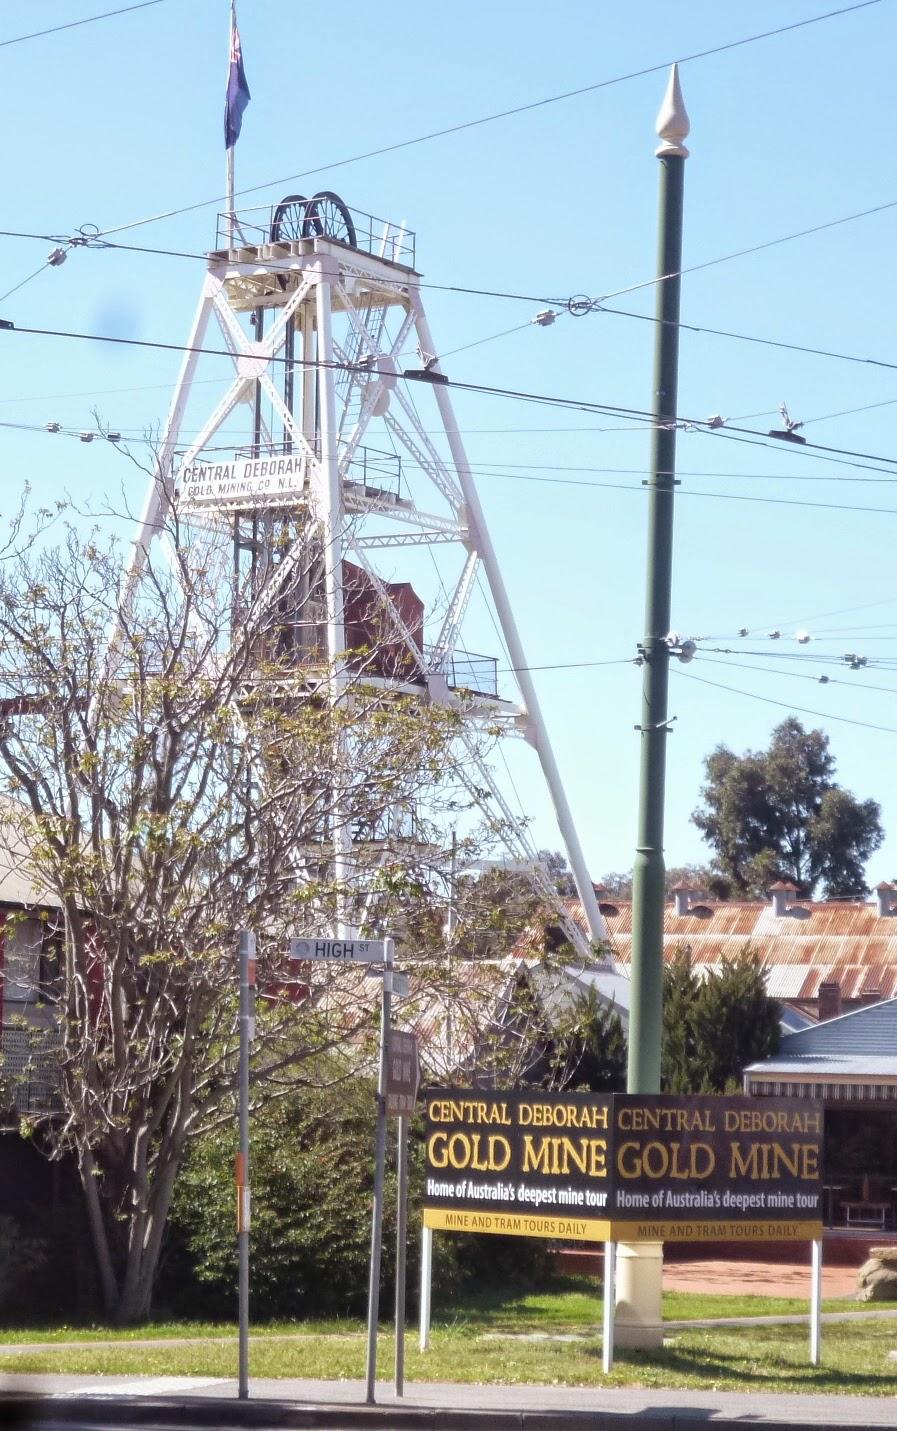 Bendigo - Central Deborah Gold Mine